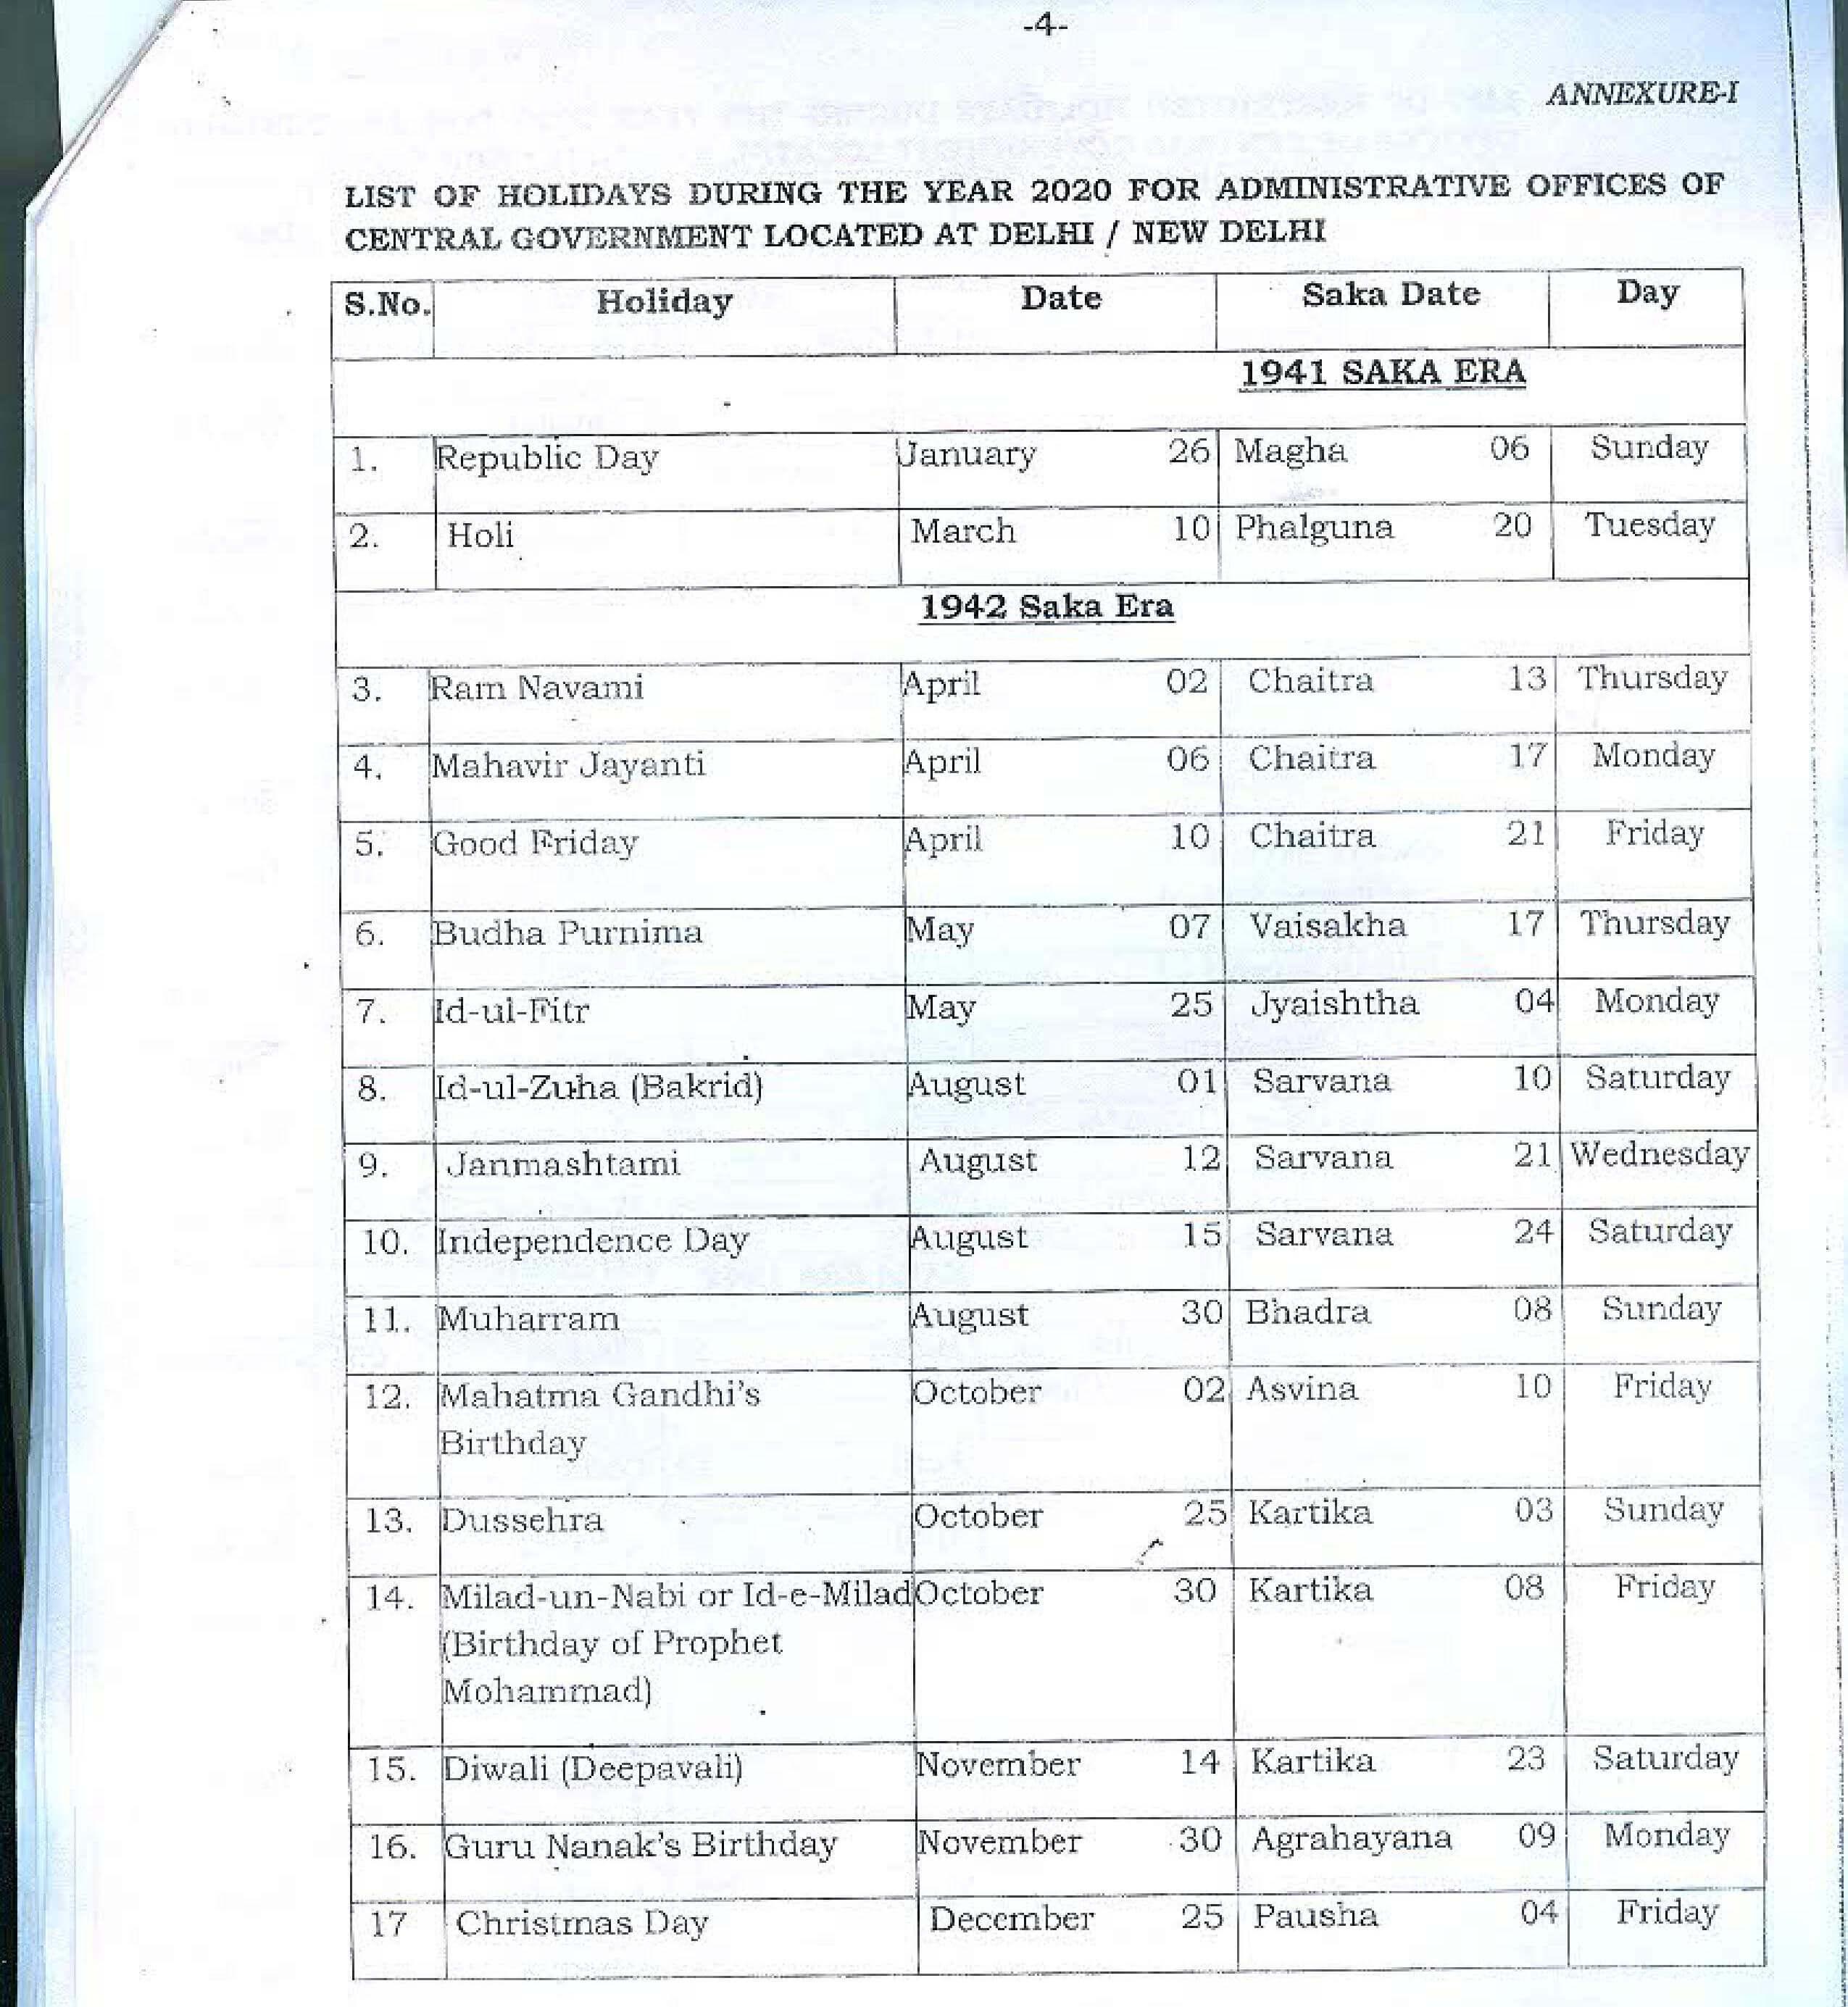 Bsnl Holidays List 2020 | Gazetted And Restricted Holidays with Bihar Sarkar Ka Calendar 2020